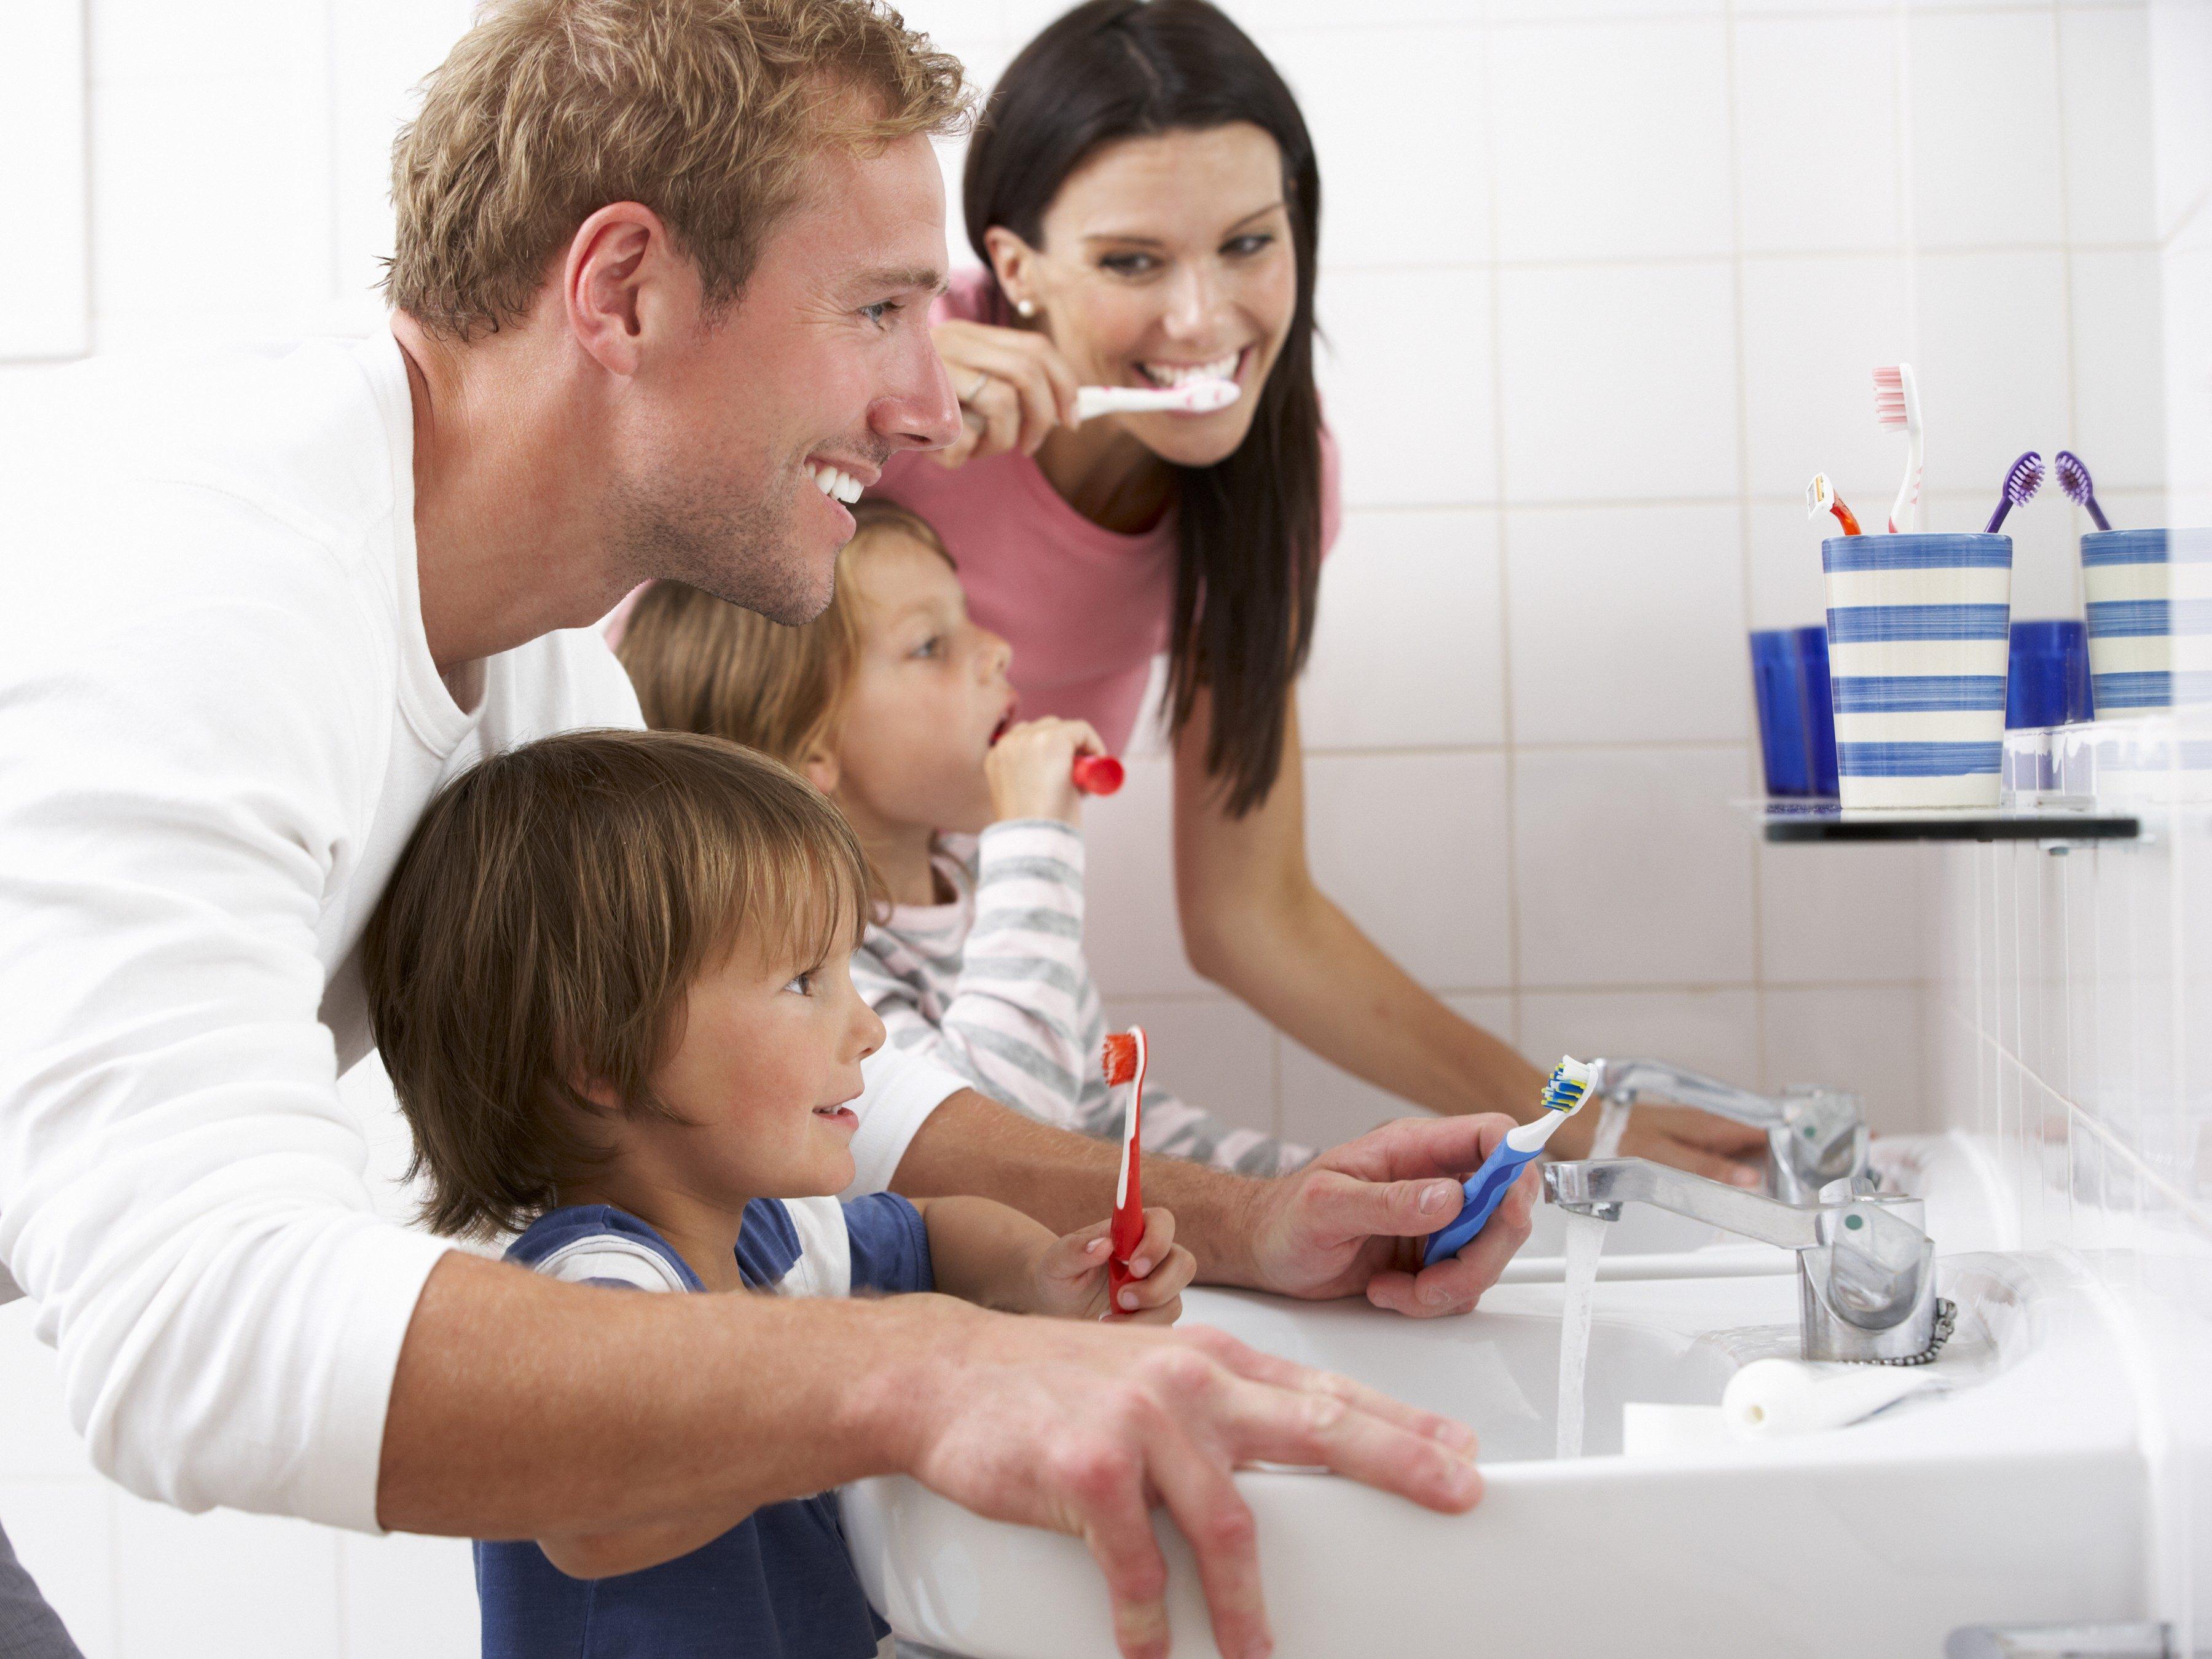 2. Hum While Brushing Your Teeth